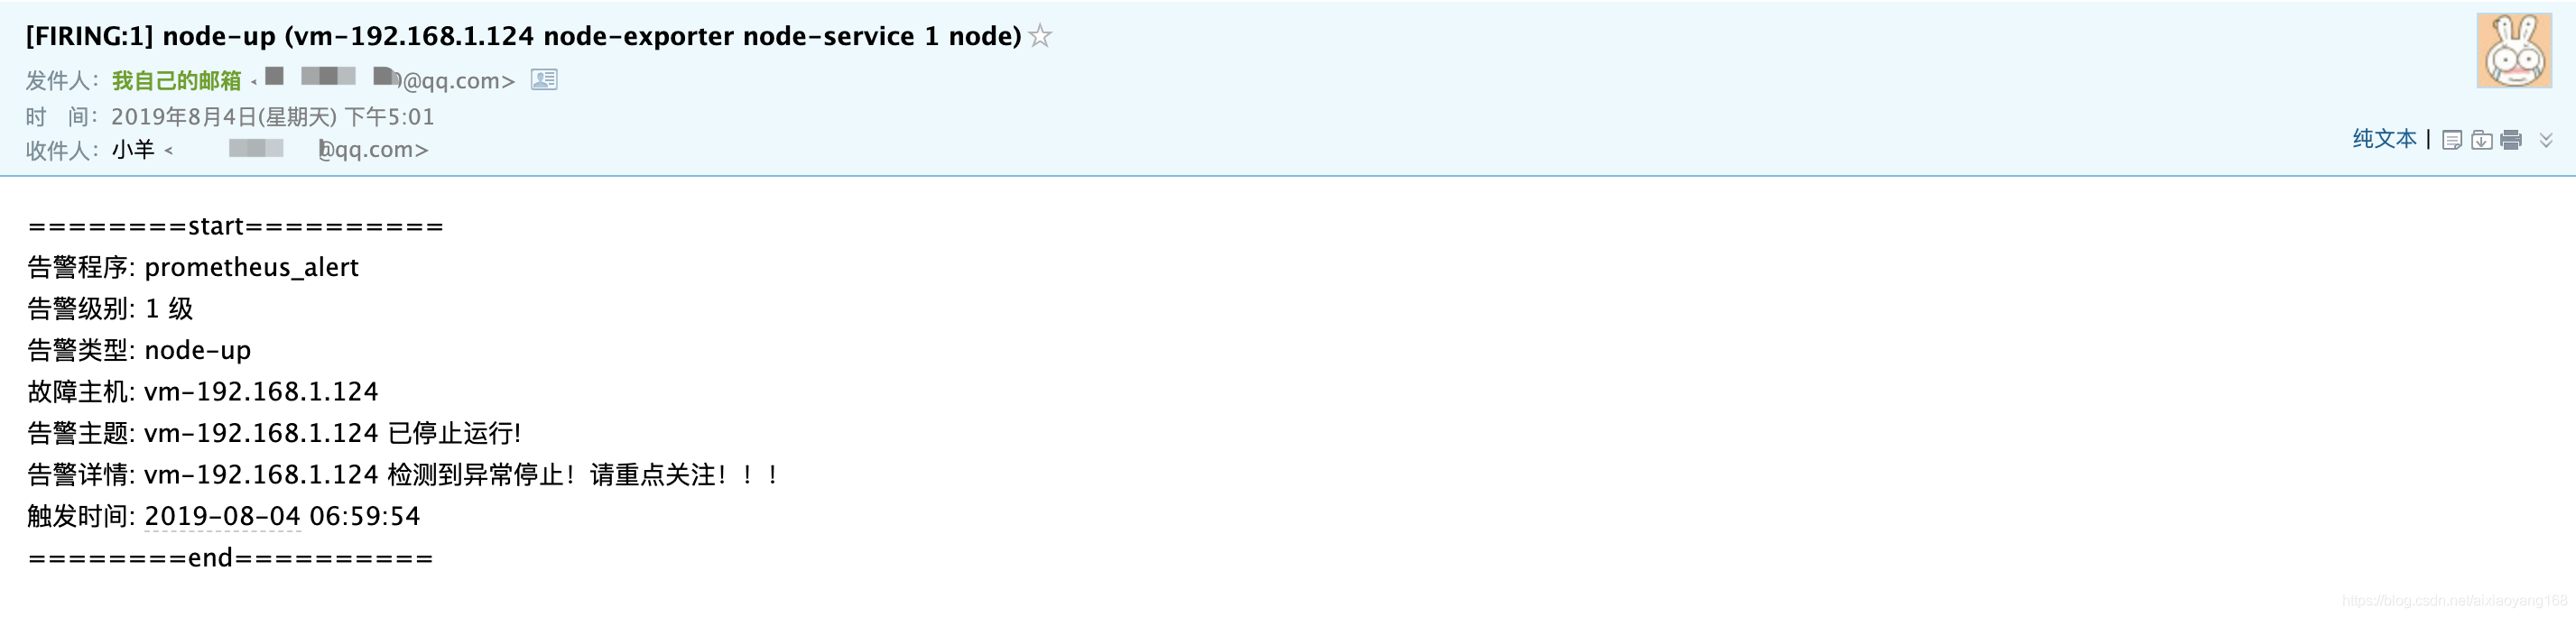 Prometheus 监控报警系统 AlertManager 之邮件告警